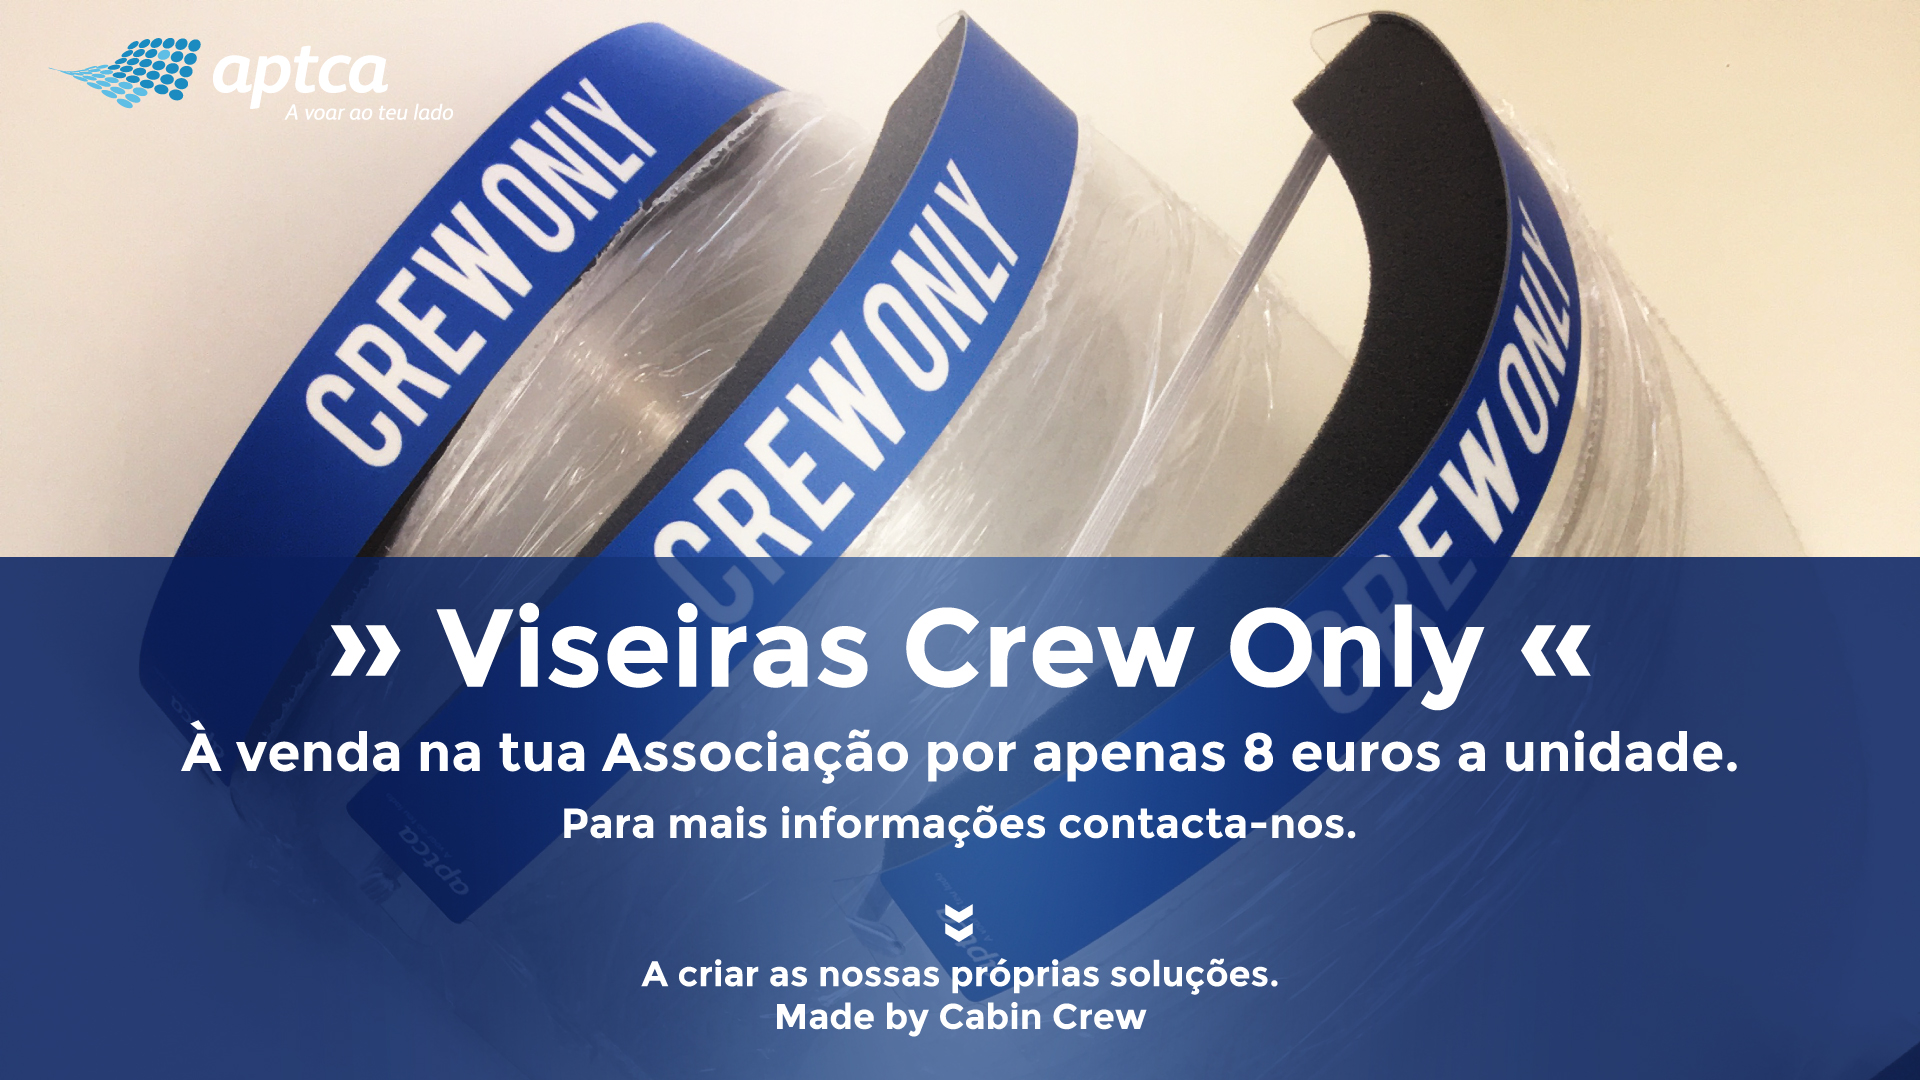 Viseira Crew Only